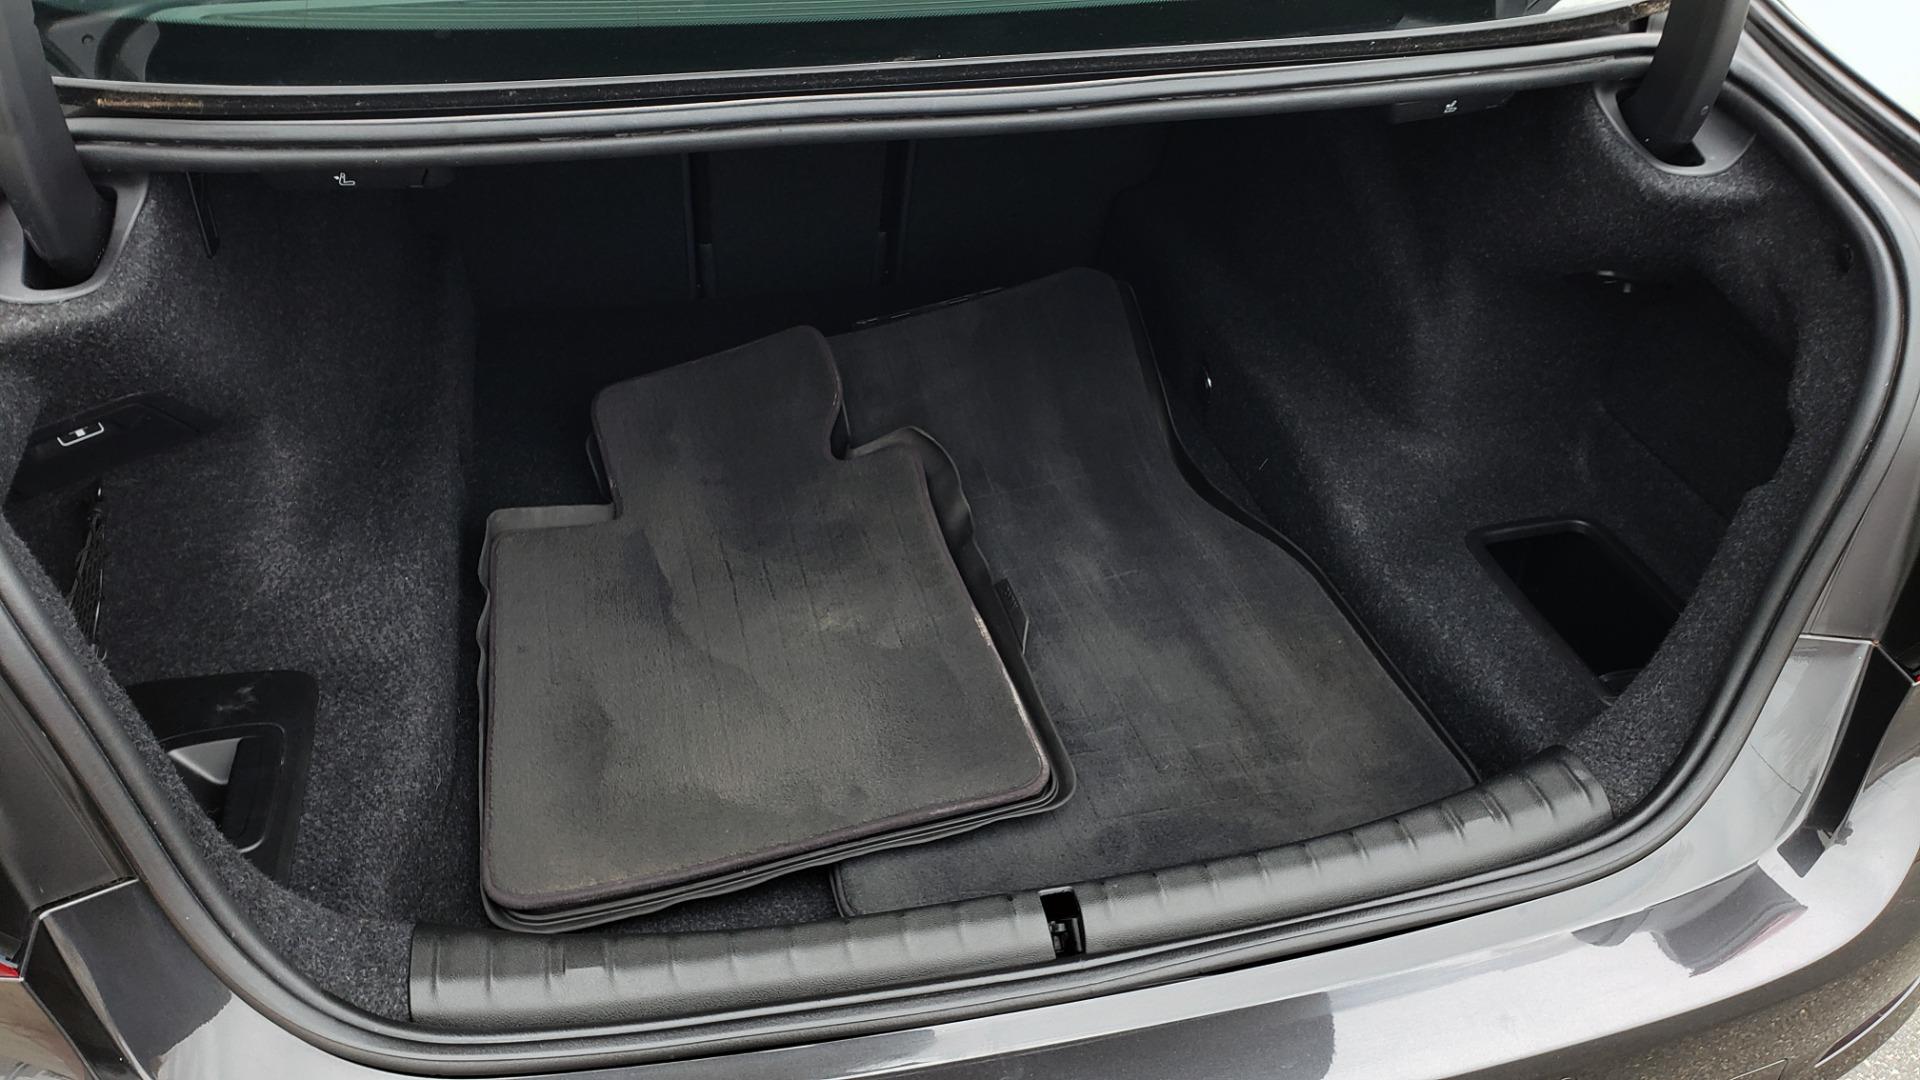 Used 2017 BMW 5 SERIES 530IXDRIVE / PREM PKG / DRVR ASST PLUS / CLD WTHR / APPLE CARPLAY for sale $30,595 at Formula Imports in Charlotte NC 28227 13